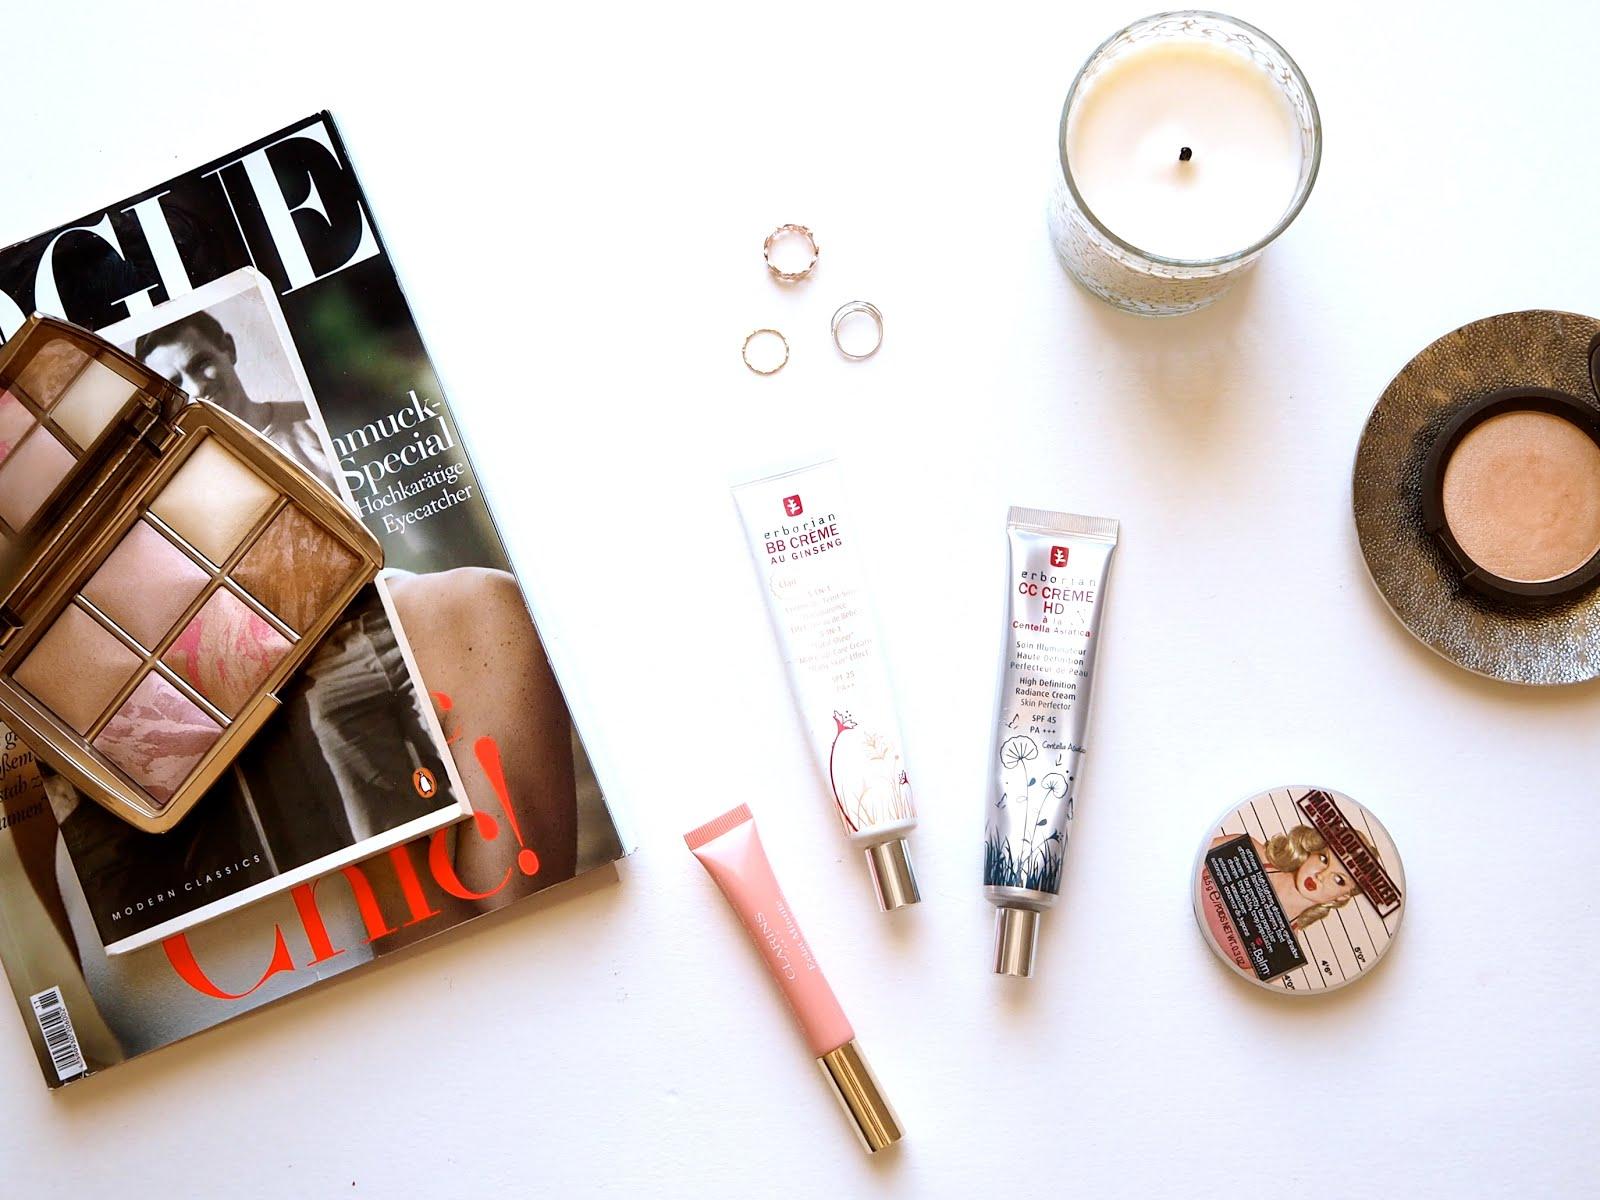 glowy makeup, highlight, glowy base, hourglass ambient lighting edit, clarins instant light lip perfector, erborian cc cream, bb cream, mary lou manizrer, becca champagne pop